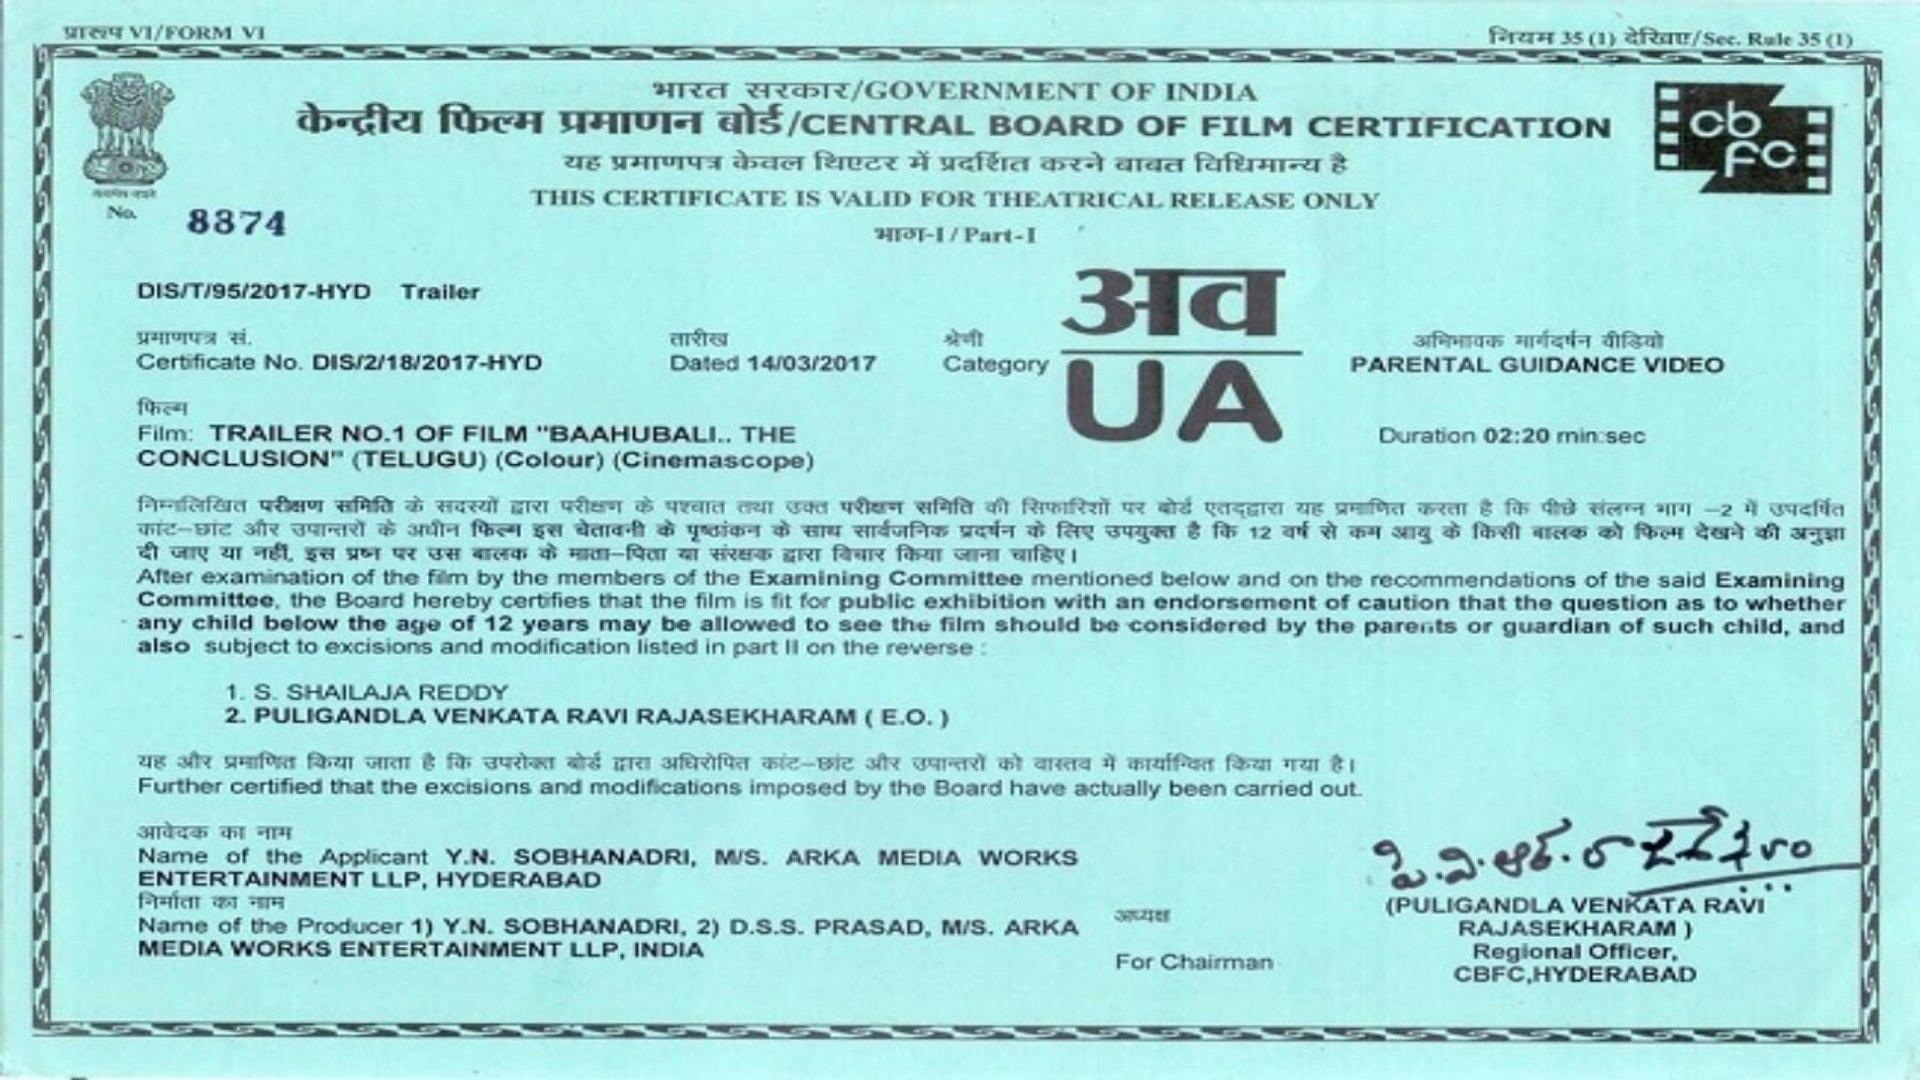 Firangi Full Hindi Movie Online Watch Free HD DVDRIP New Bollywood Hindi  Movies 2018 2017 HD F U L L M O V I E DVDRIP English Subtitles Youtube  Dailymotion